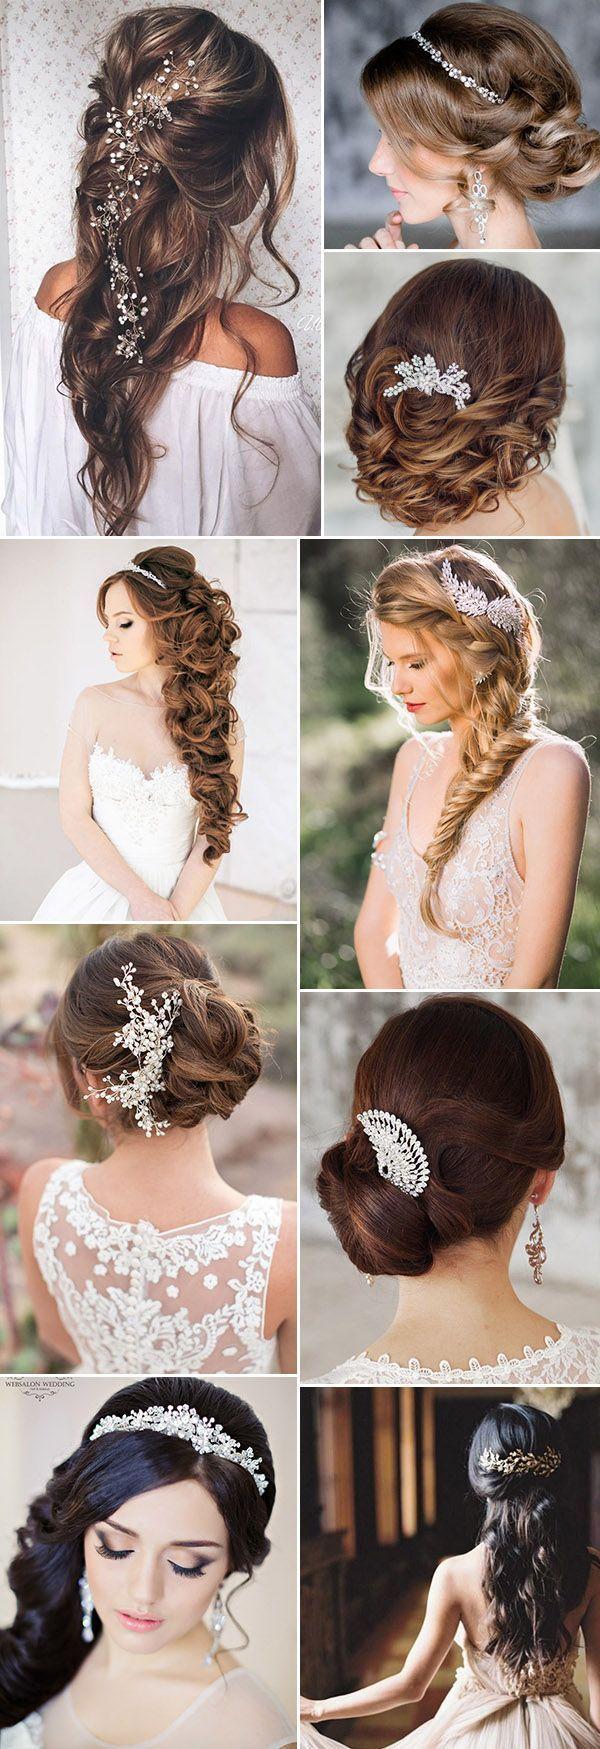 7 best bridal hair images on pinterest | hairdo wedding, bridal